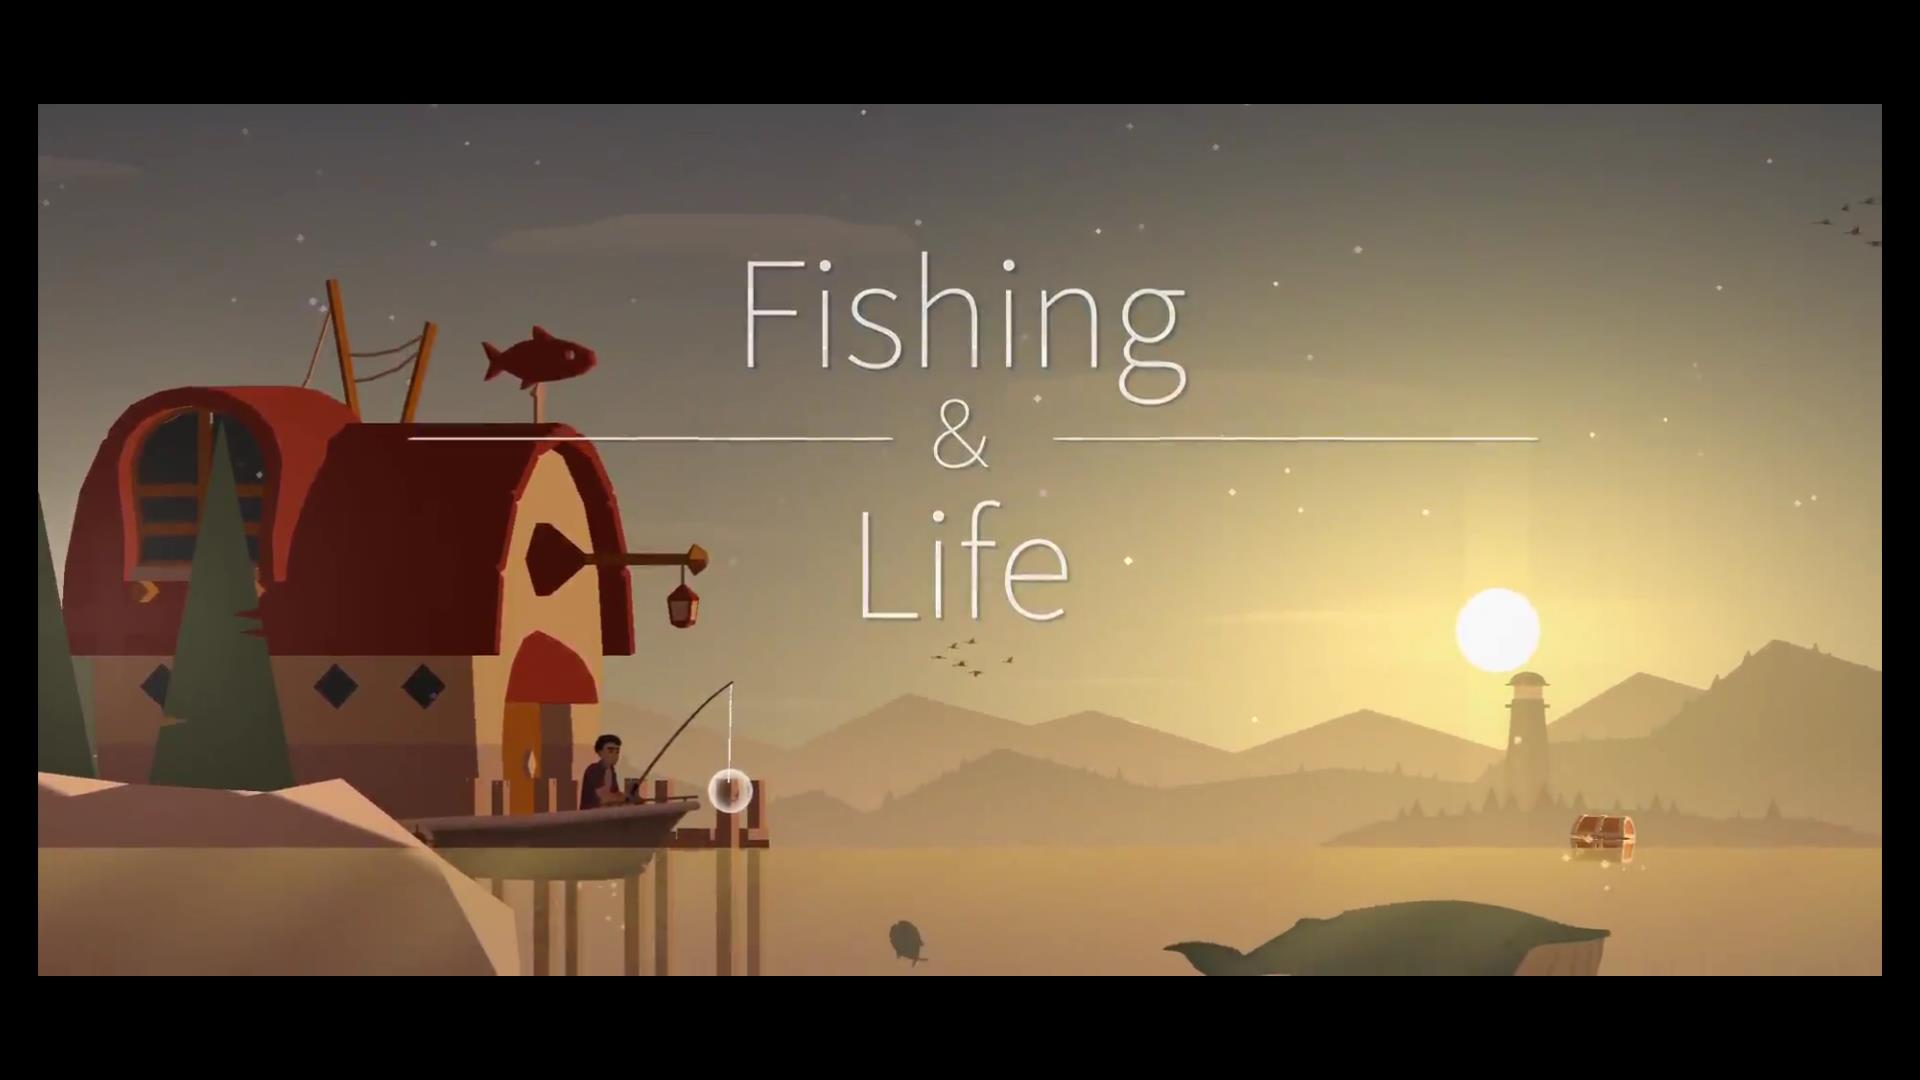 Fishing & Life タイトル画面